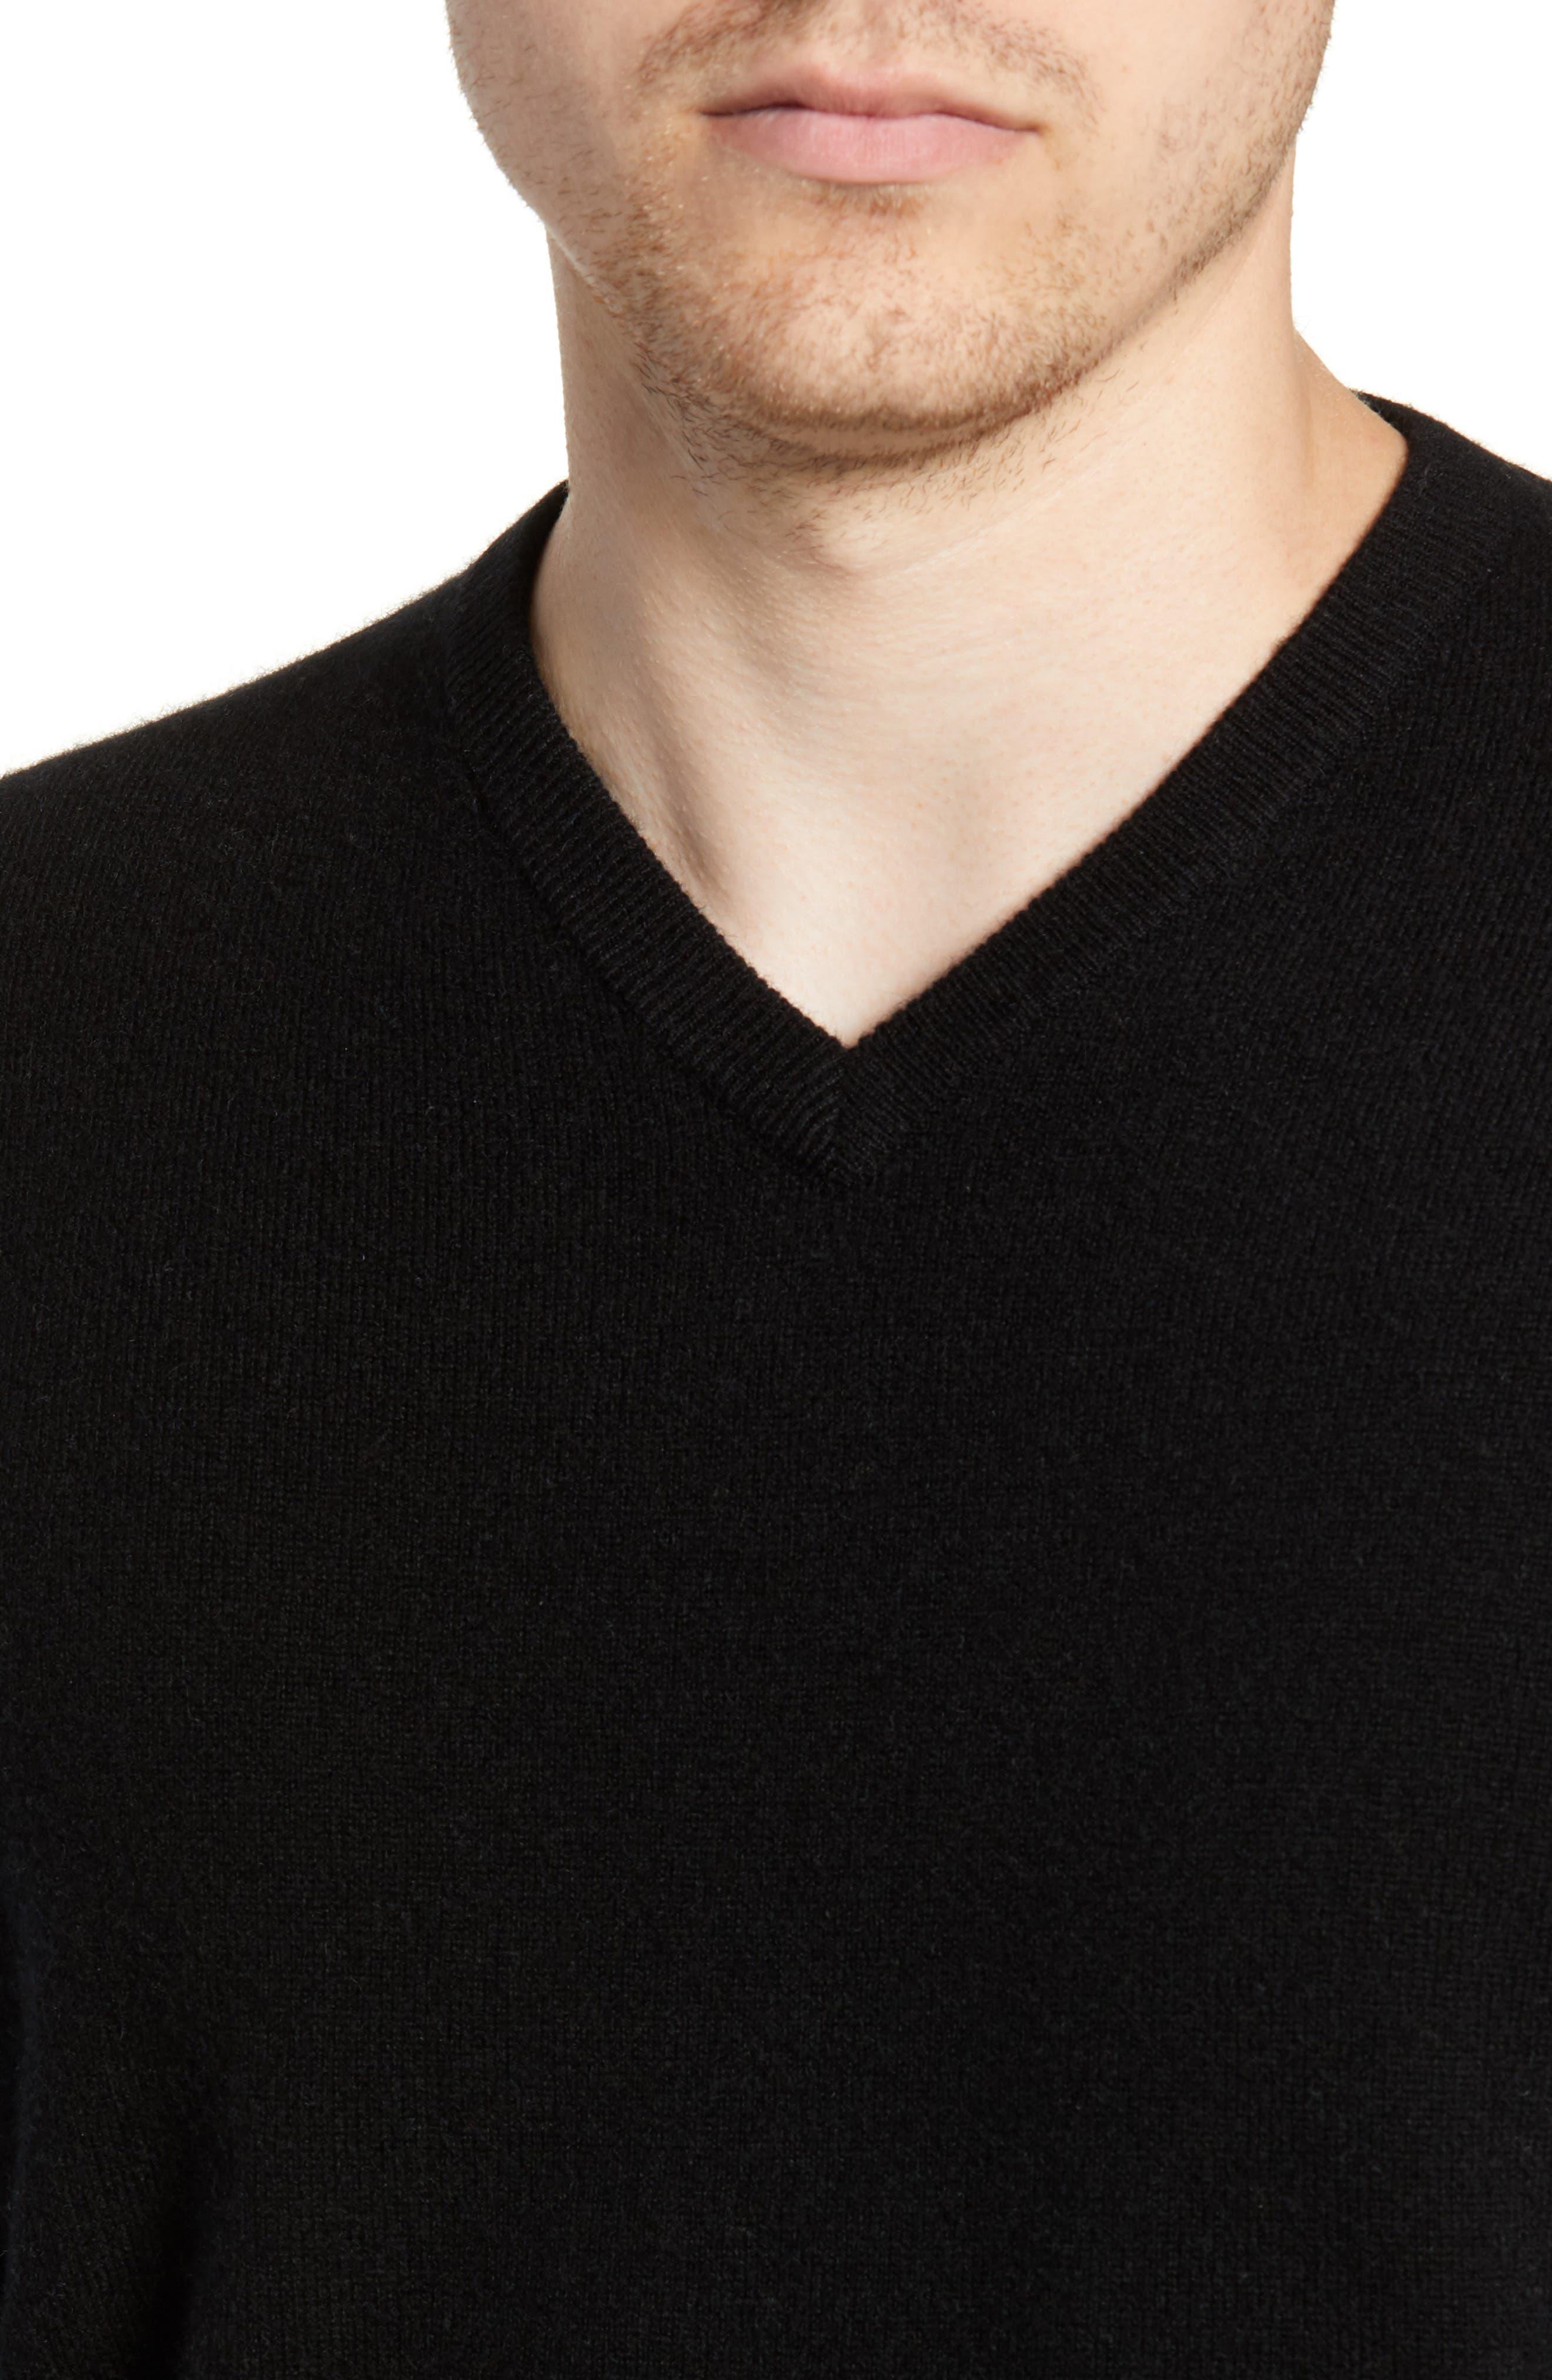 Cashmere V-Neck Sweater,                             Alternate thumbnail 4, color,                             BLACK CAVIAR